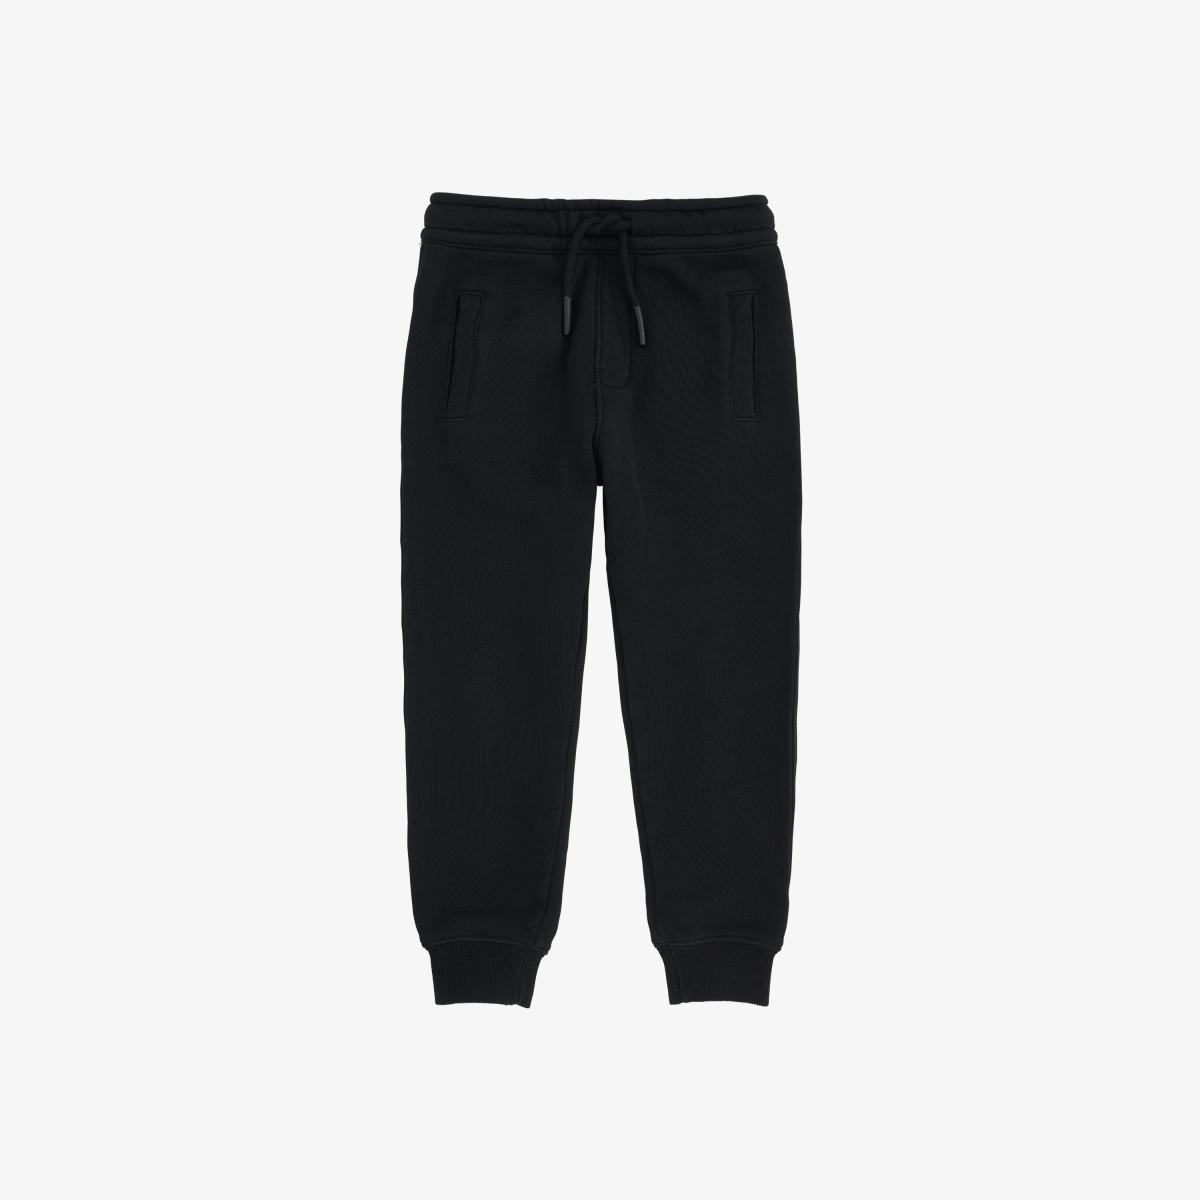 BOY'S PANT LONG BASIC COTT.FL BLACK